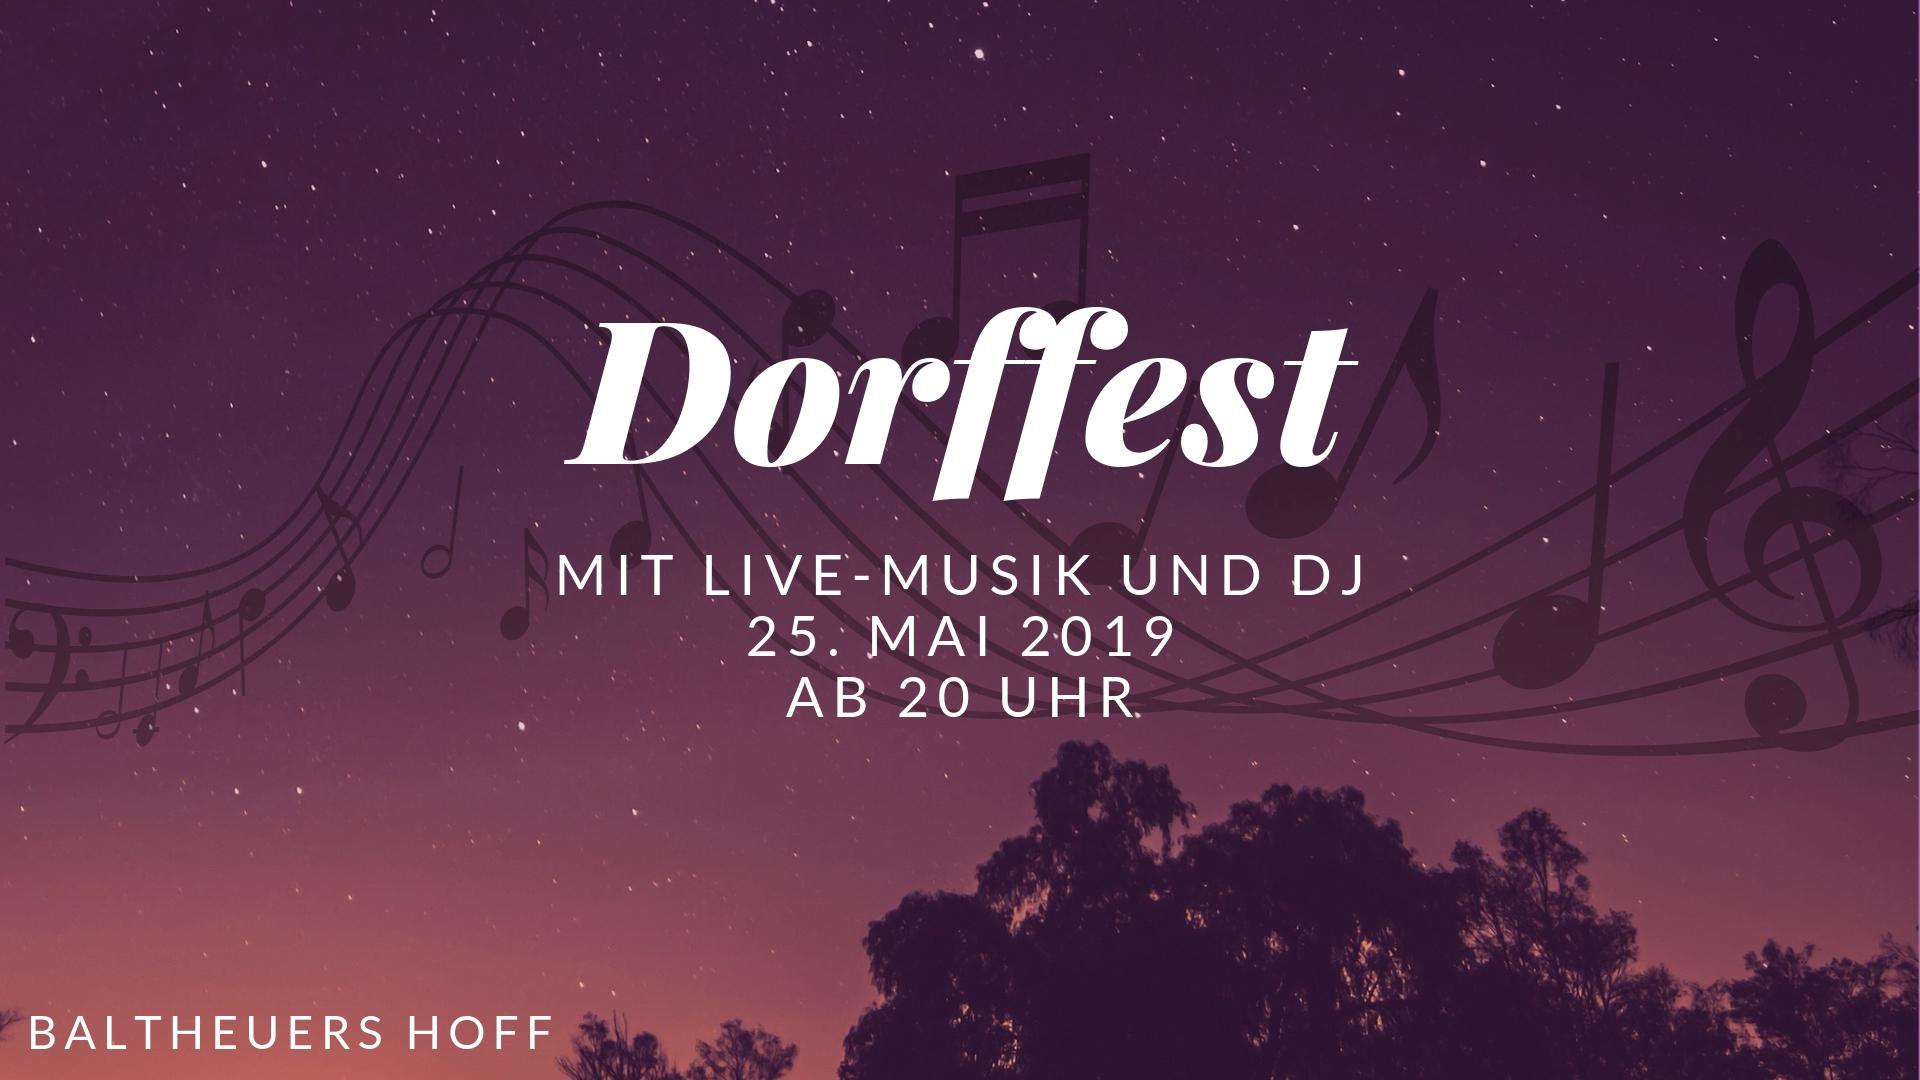 Arpker Dorffest 25. Mai 2019